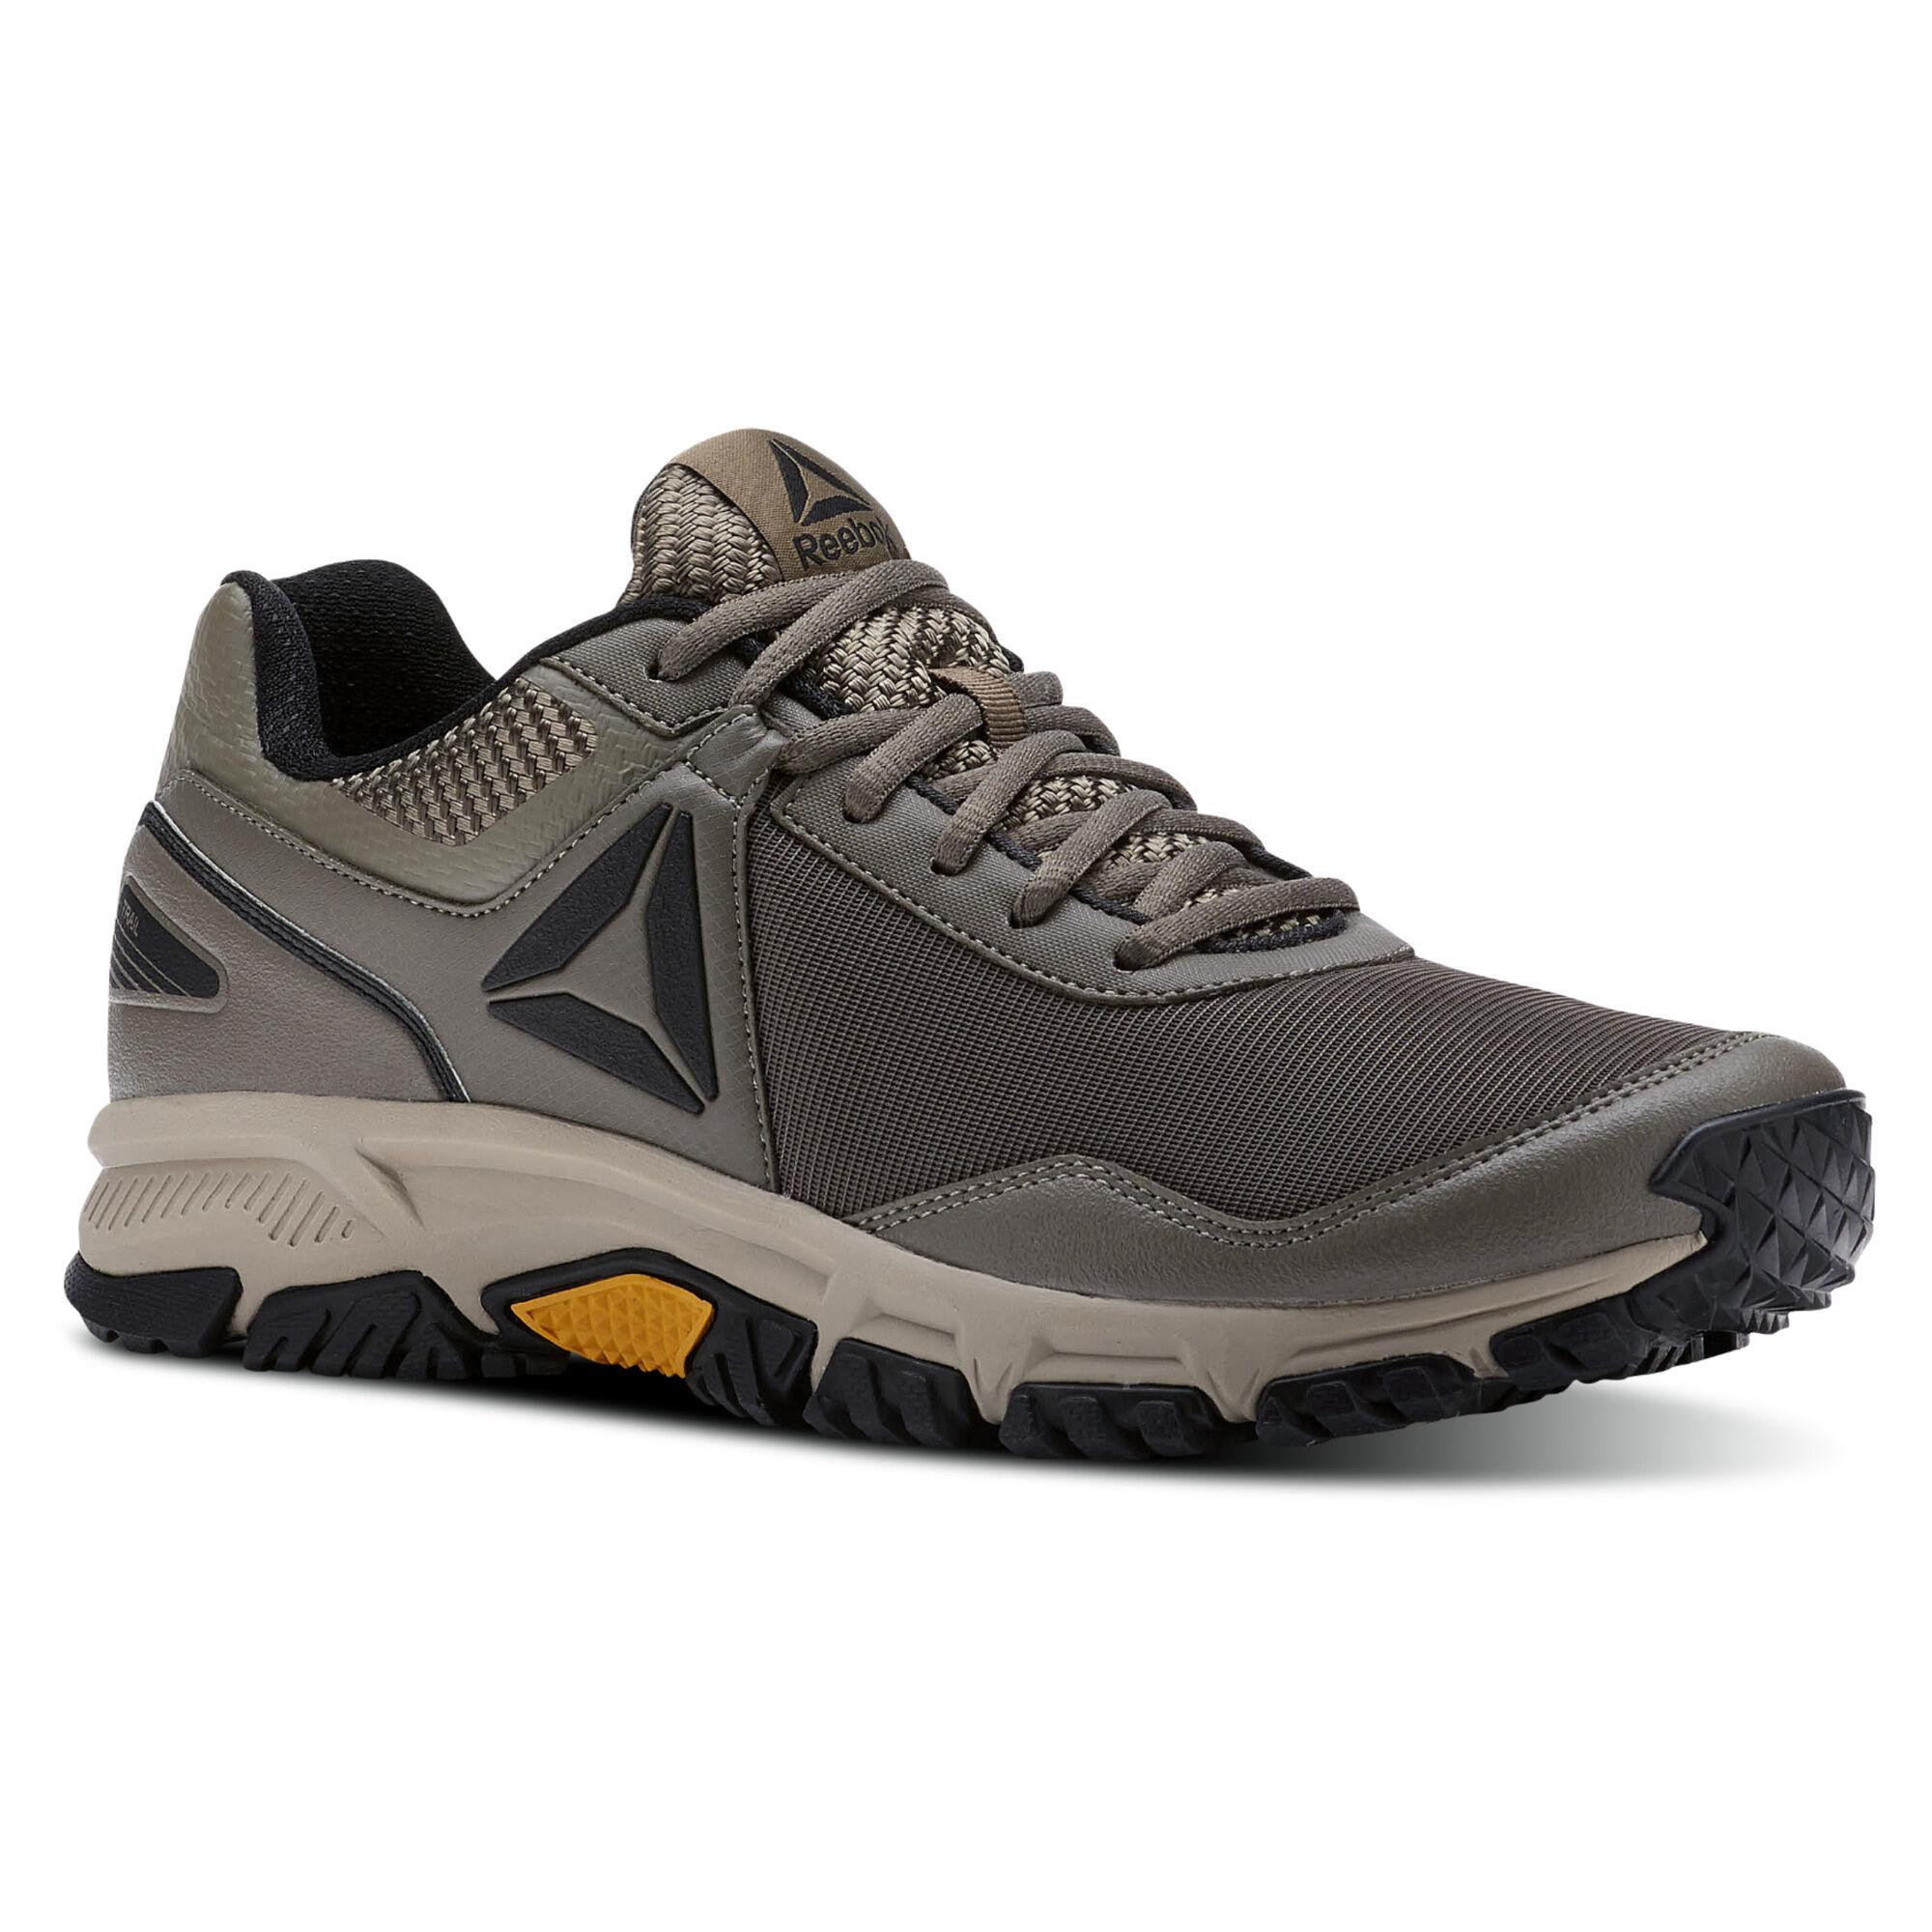 ac0ccb00ac Reebok Ridgerider Trail 3.0. - Grey | Reebok MLT